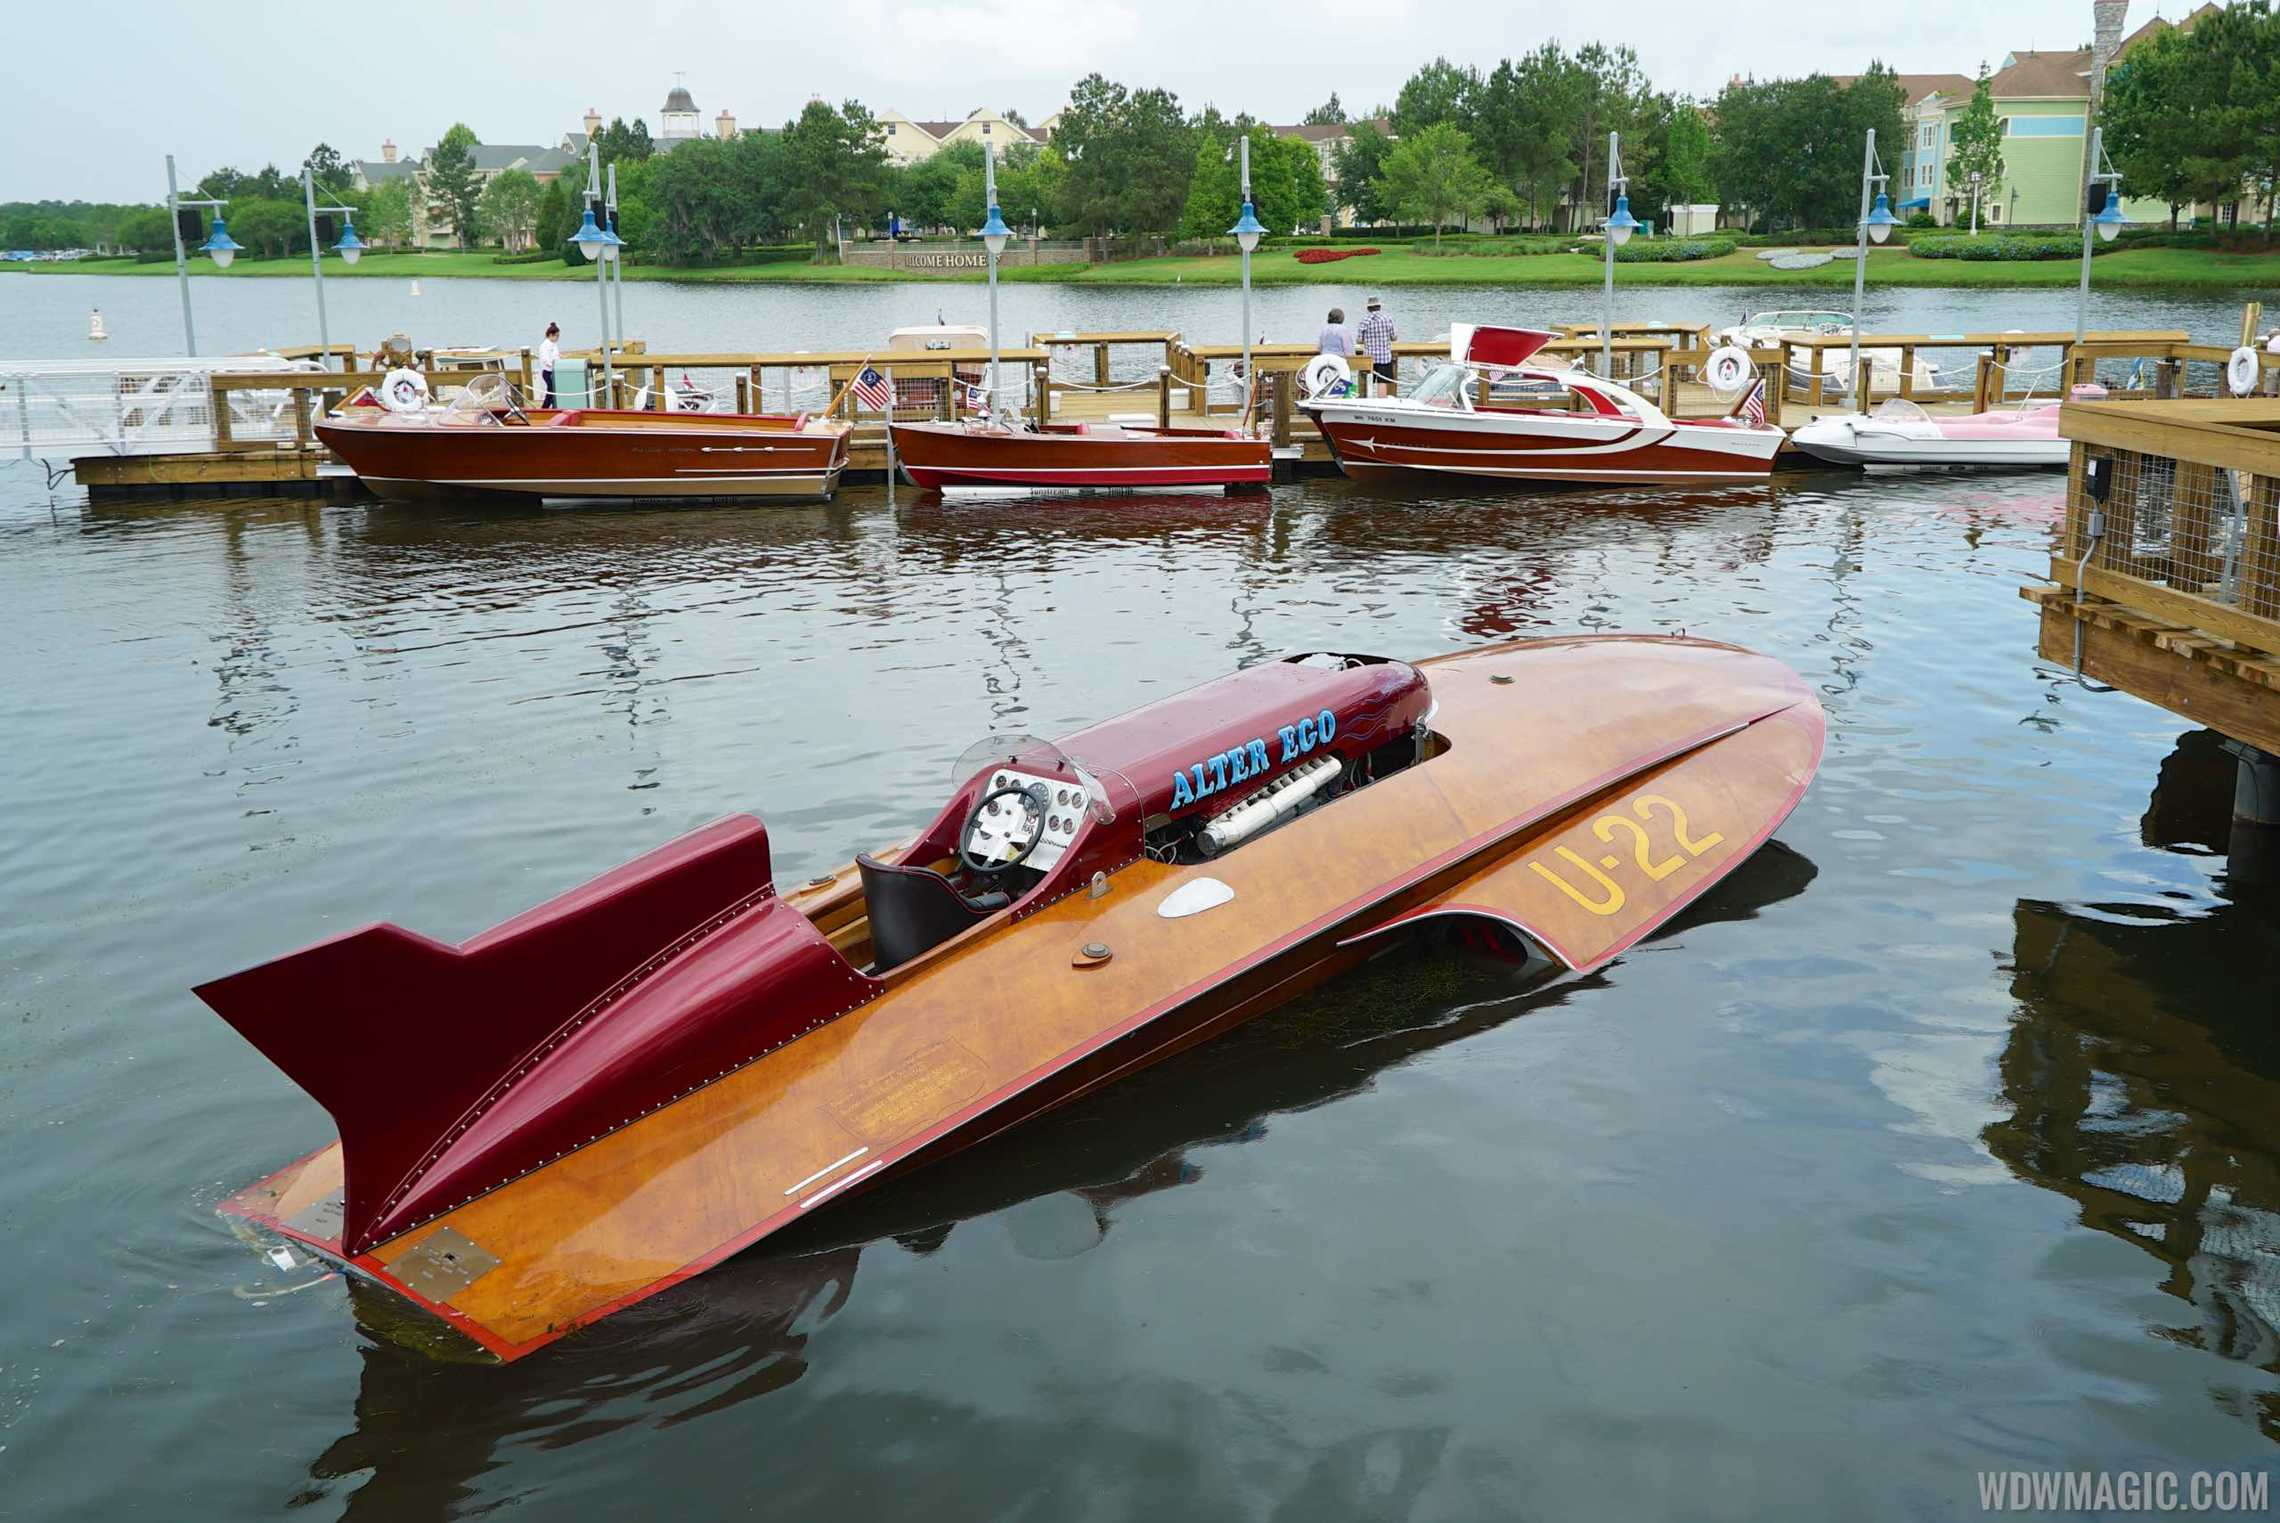 The BOATHOUSE - The watercraft fleet